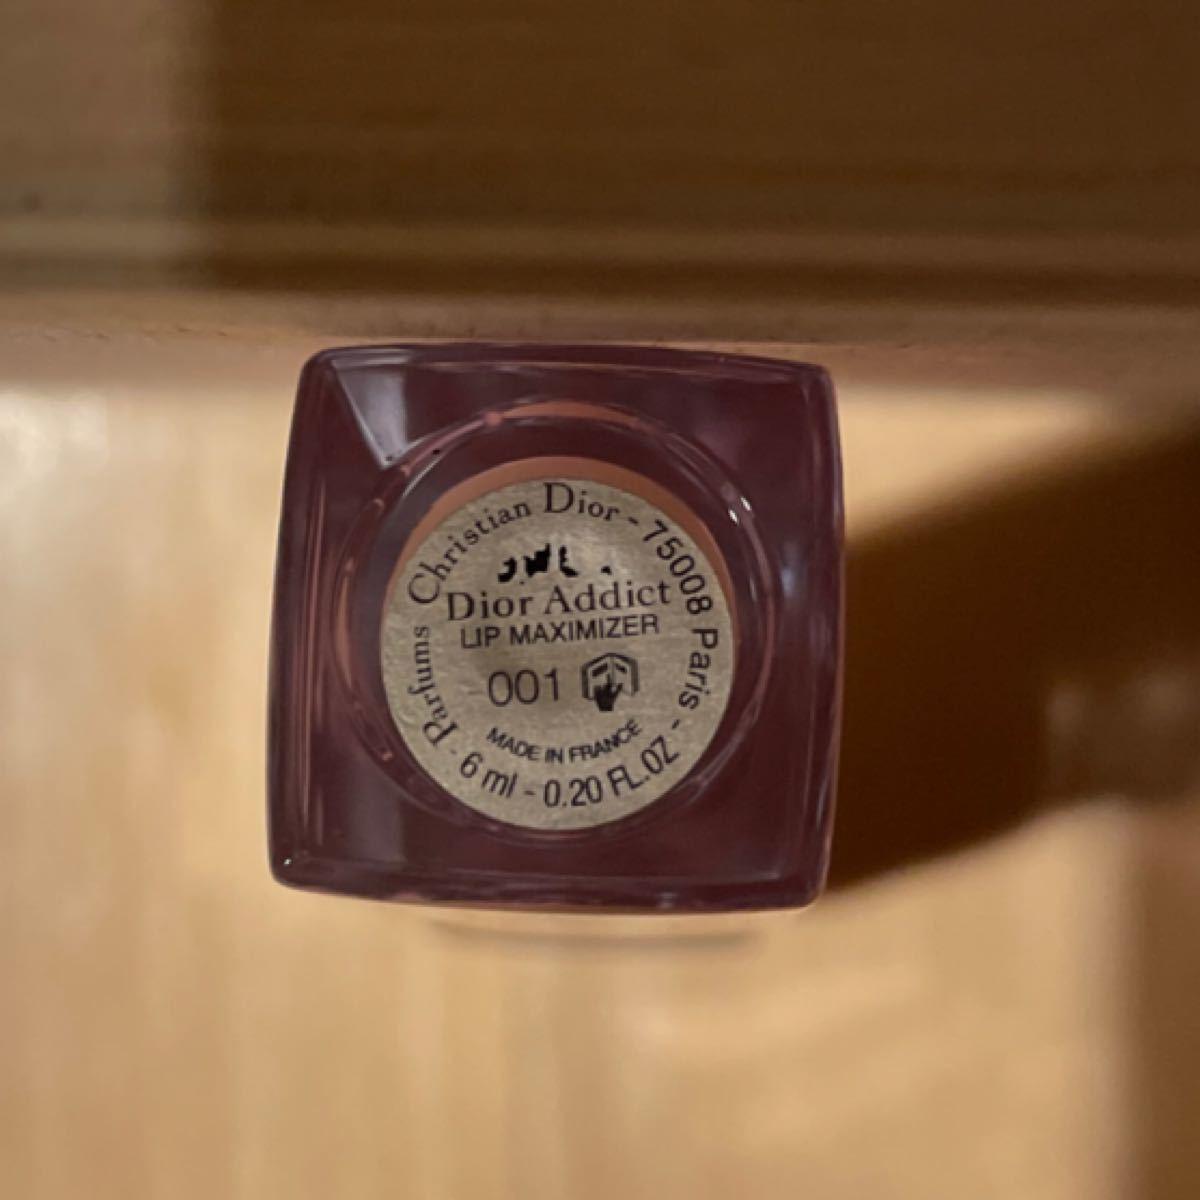 Dior ディオールアディクトリップ マキシマイザー リップグロス クリスチャンディオール